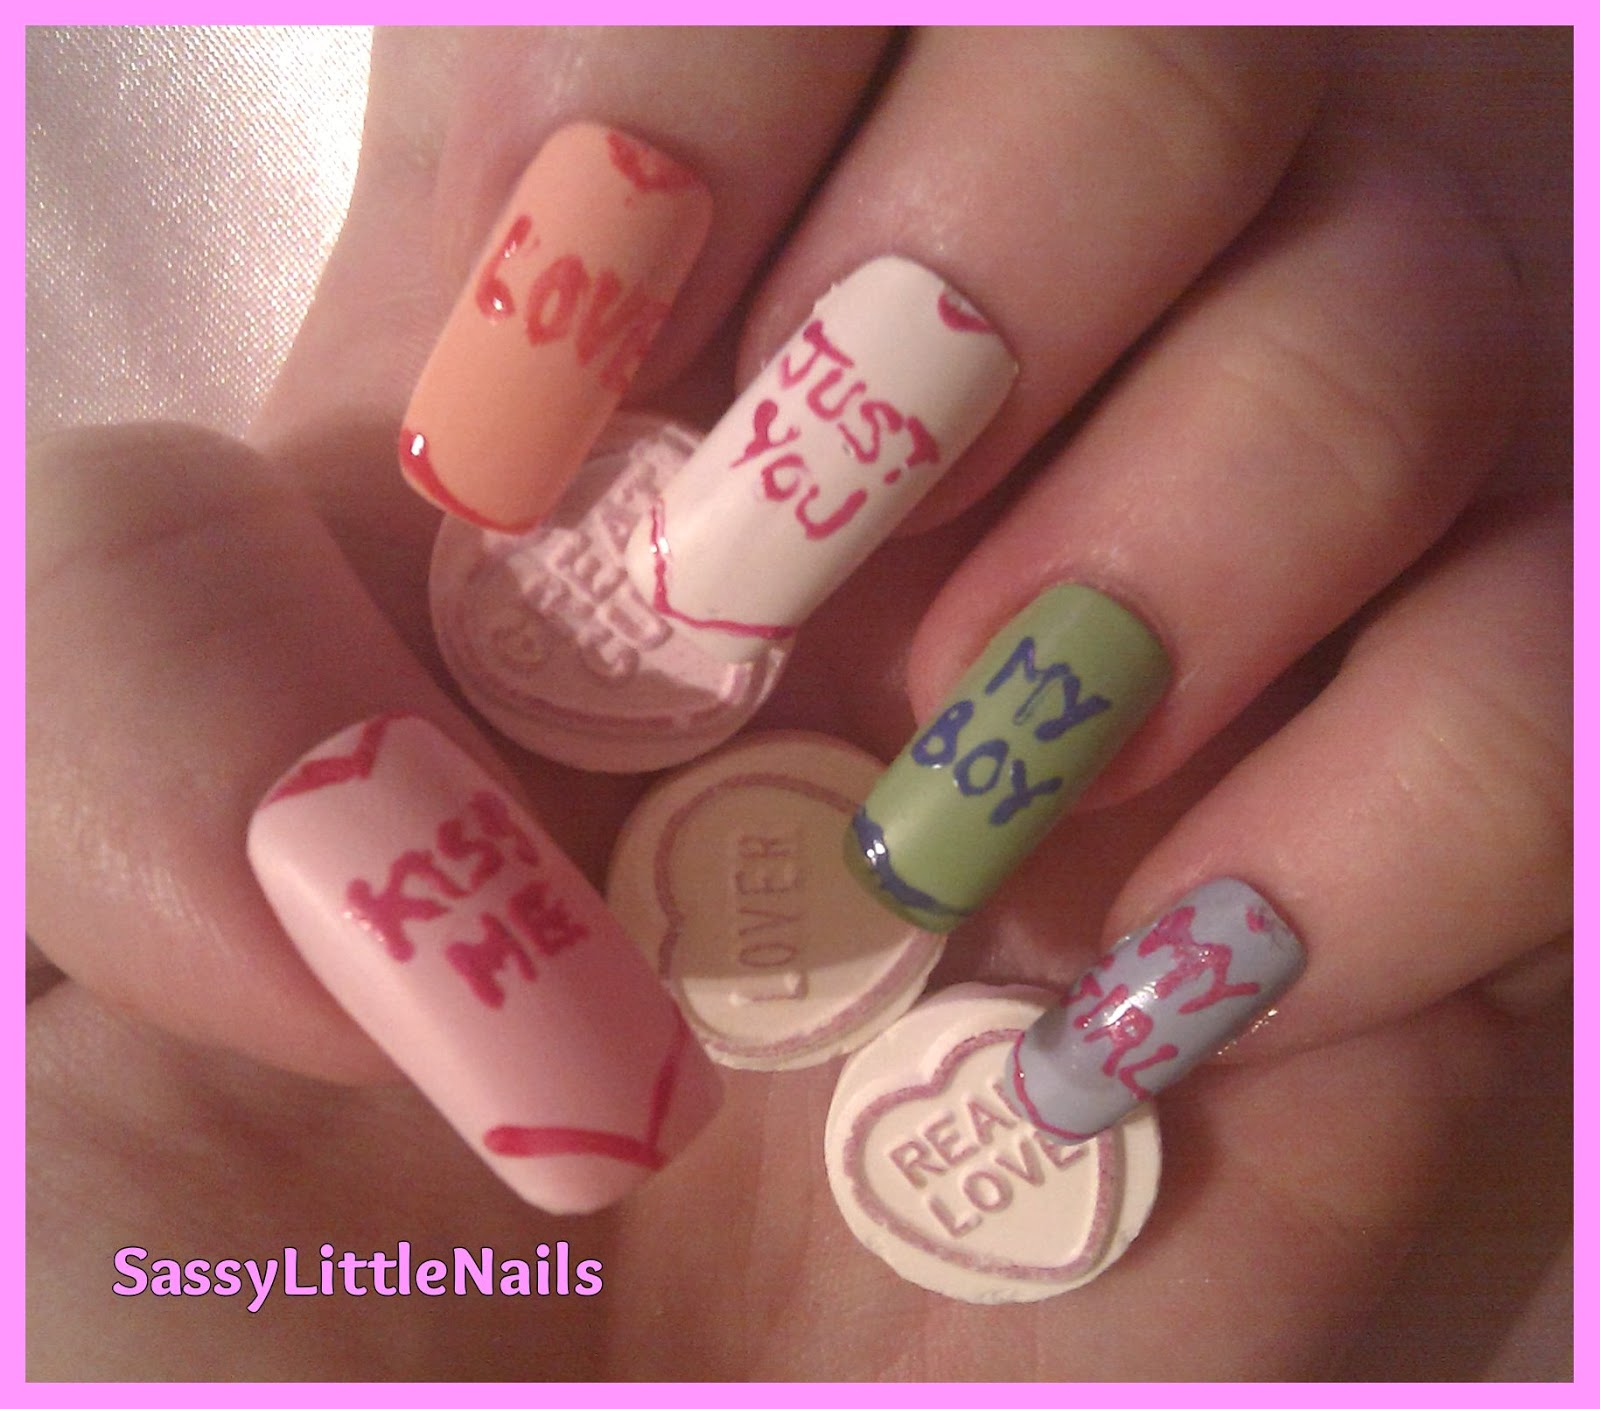 SassyLittleNails: Love Heart sweets nails